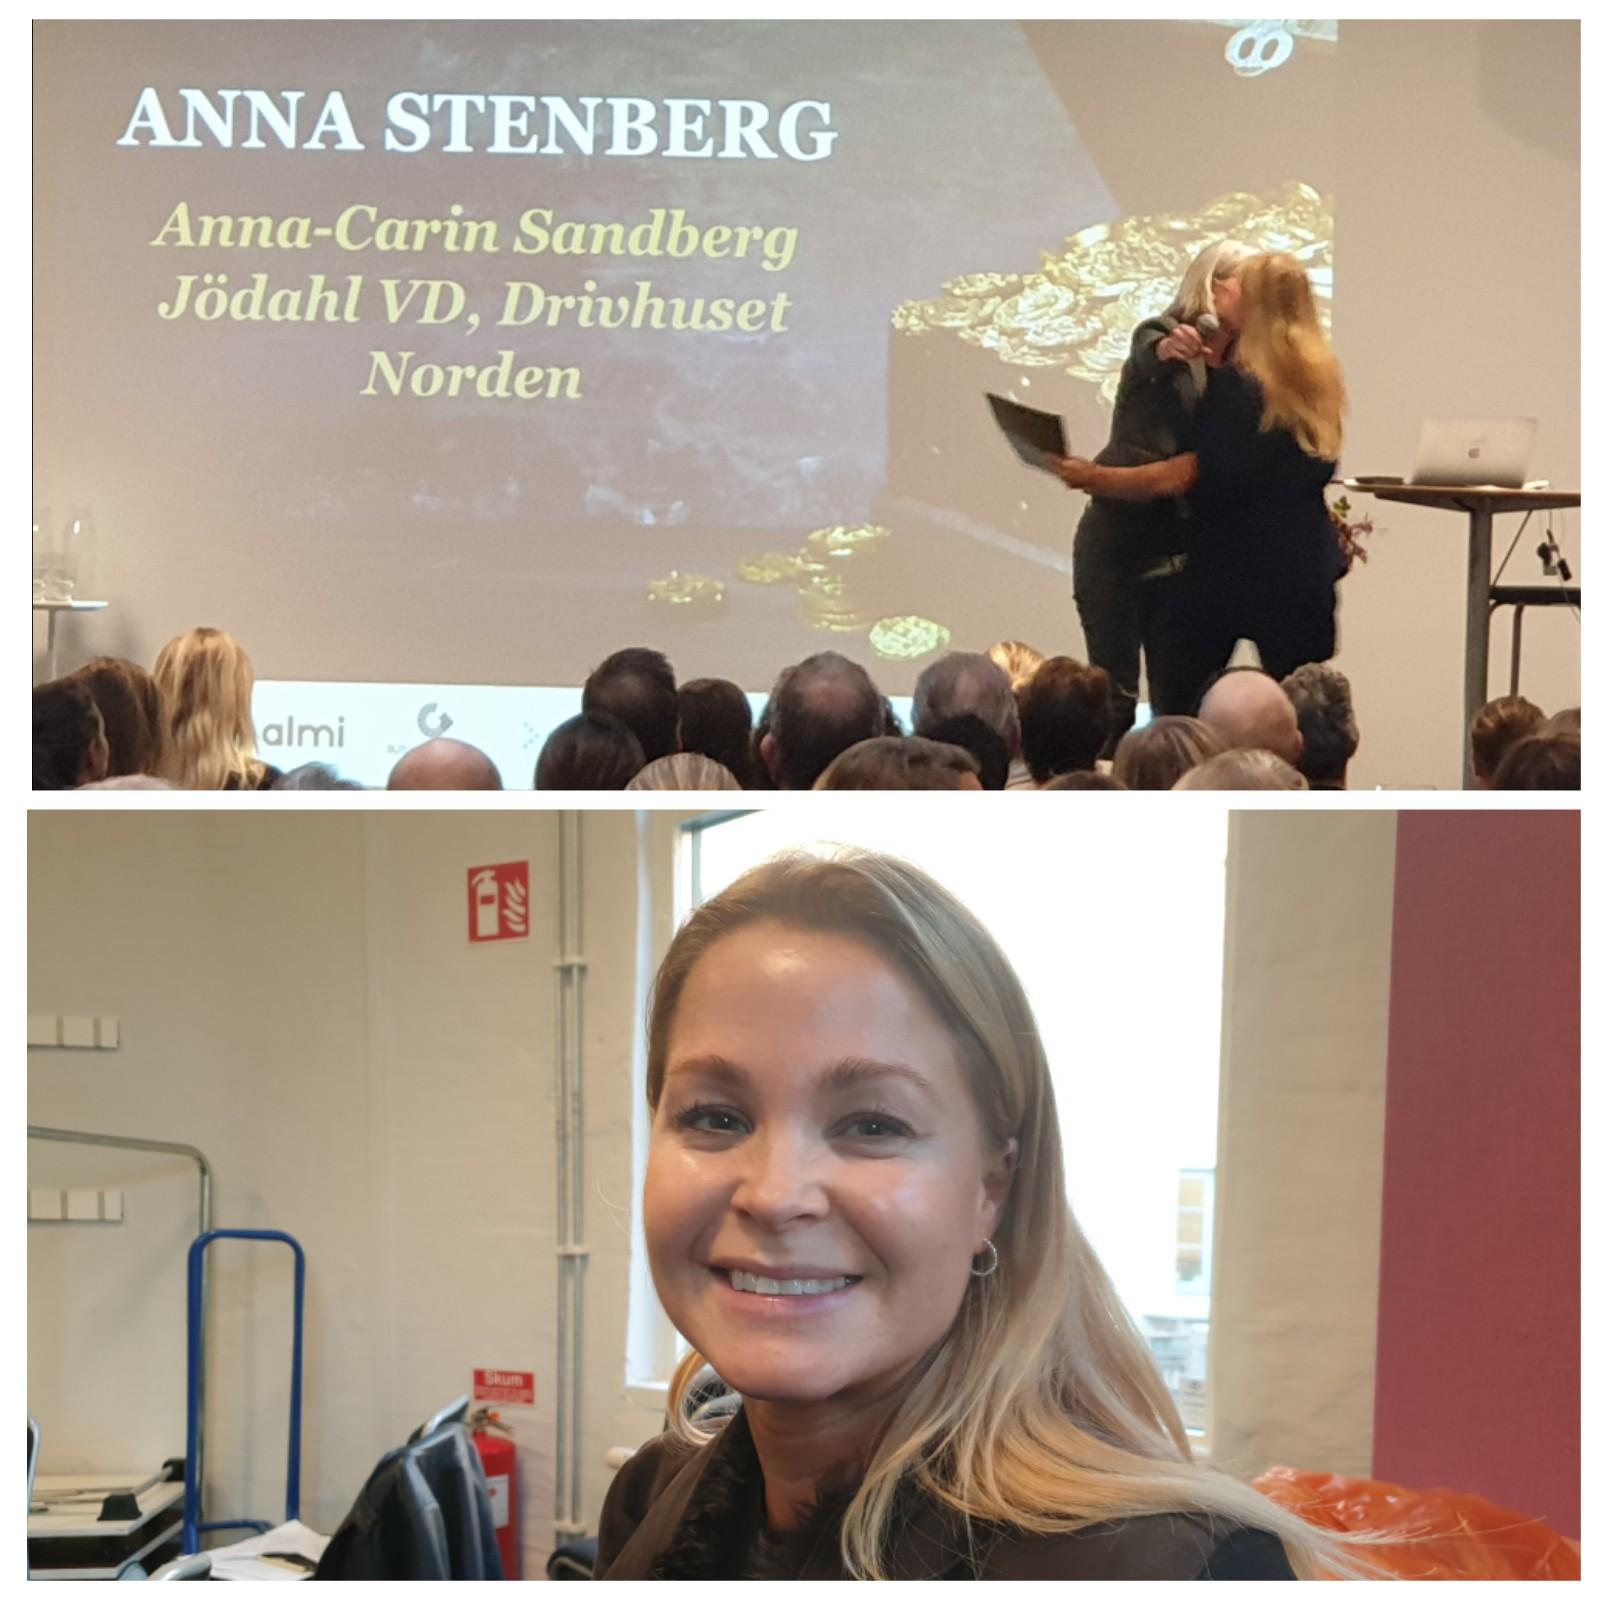 Anna Stenberg: The Ace Recruiter & Woman Entrepreneur 2019